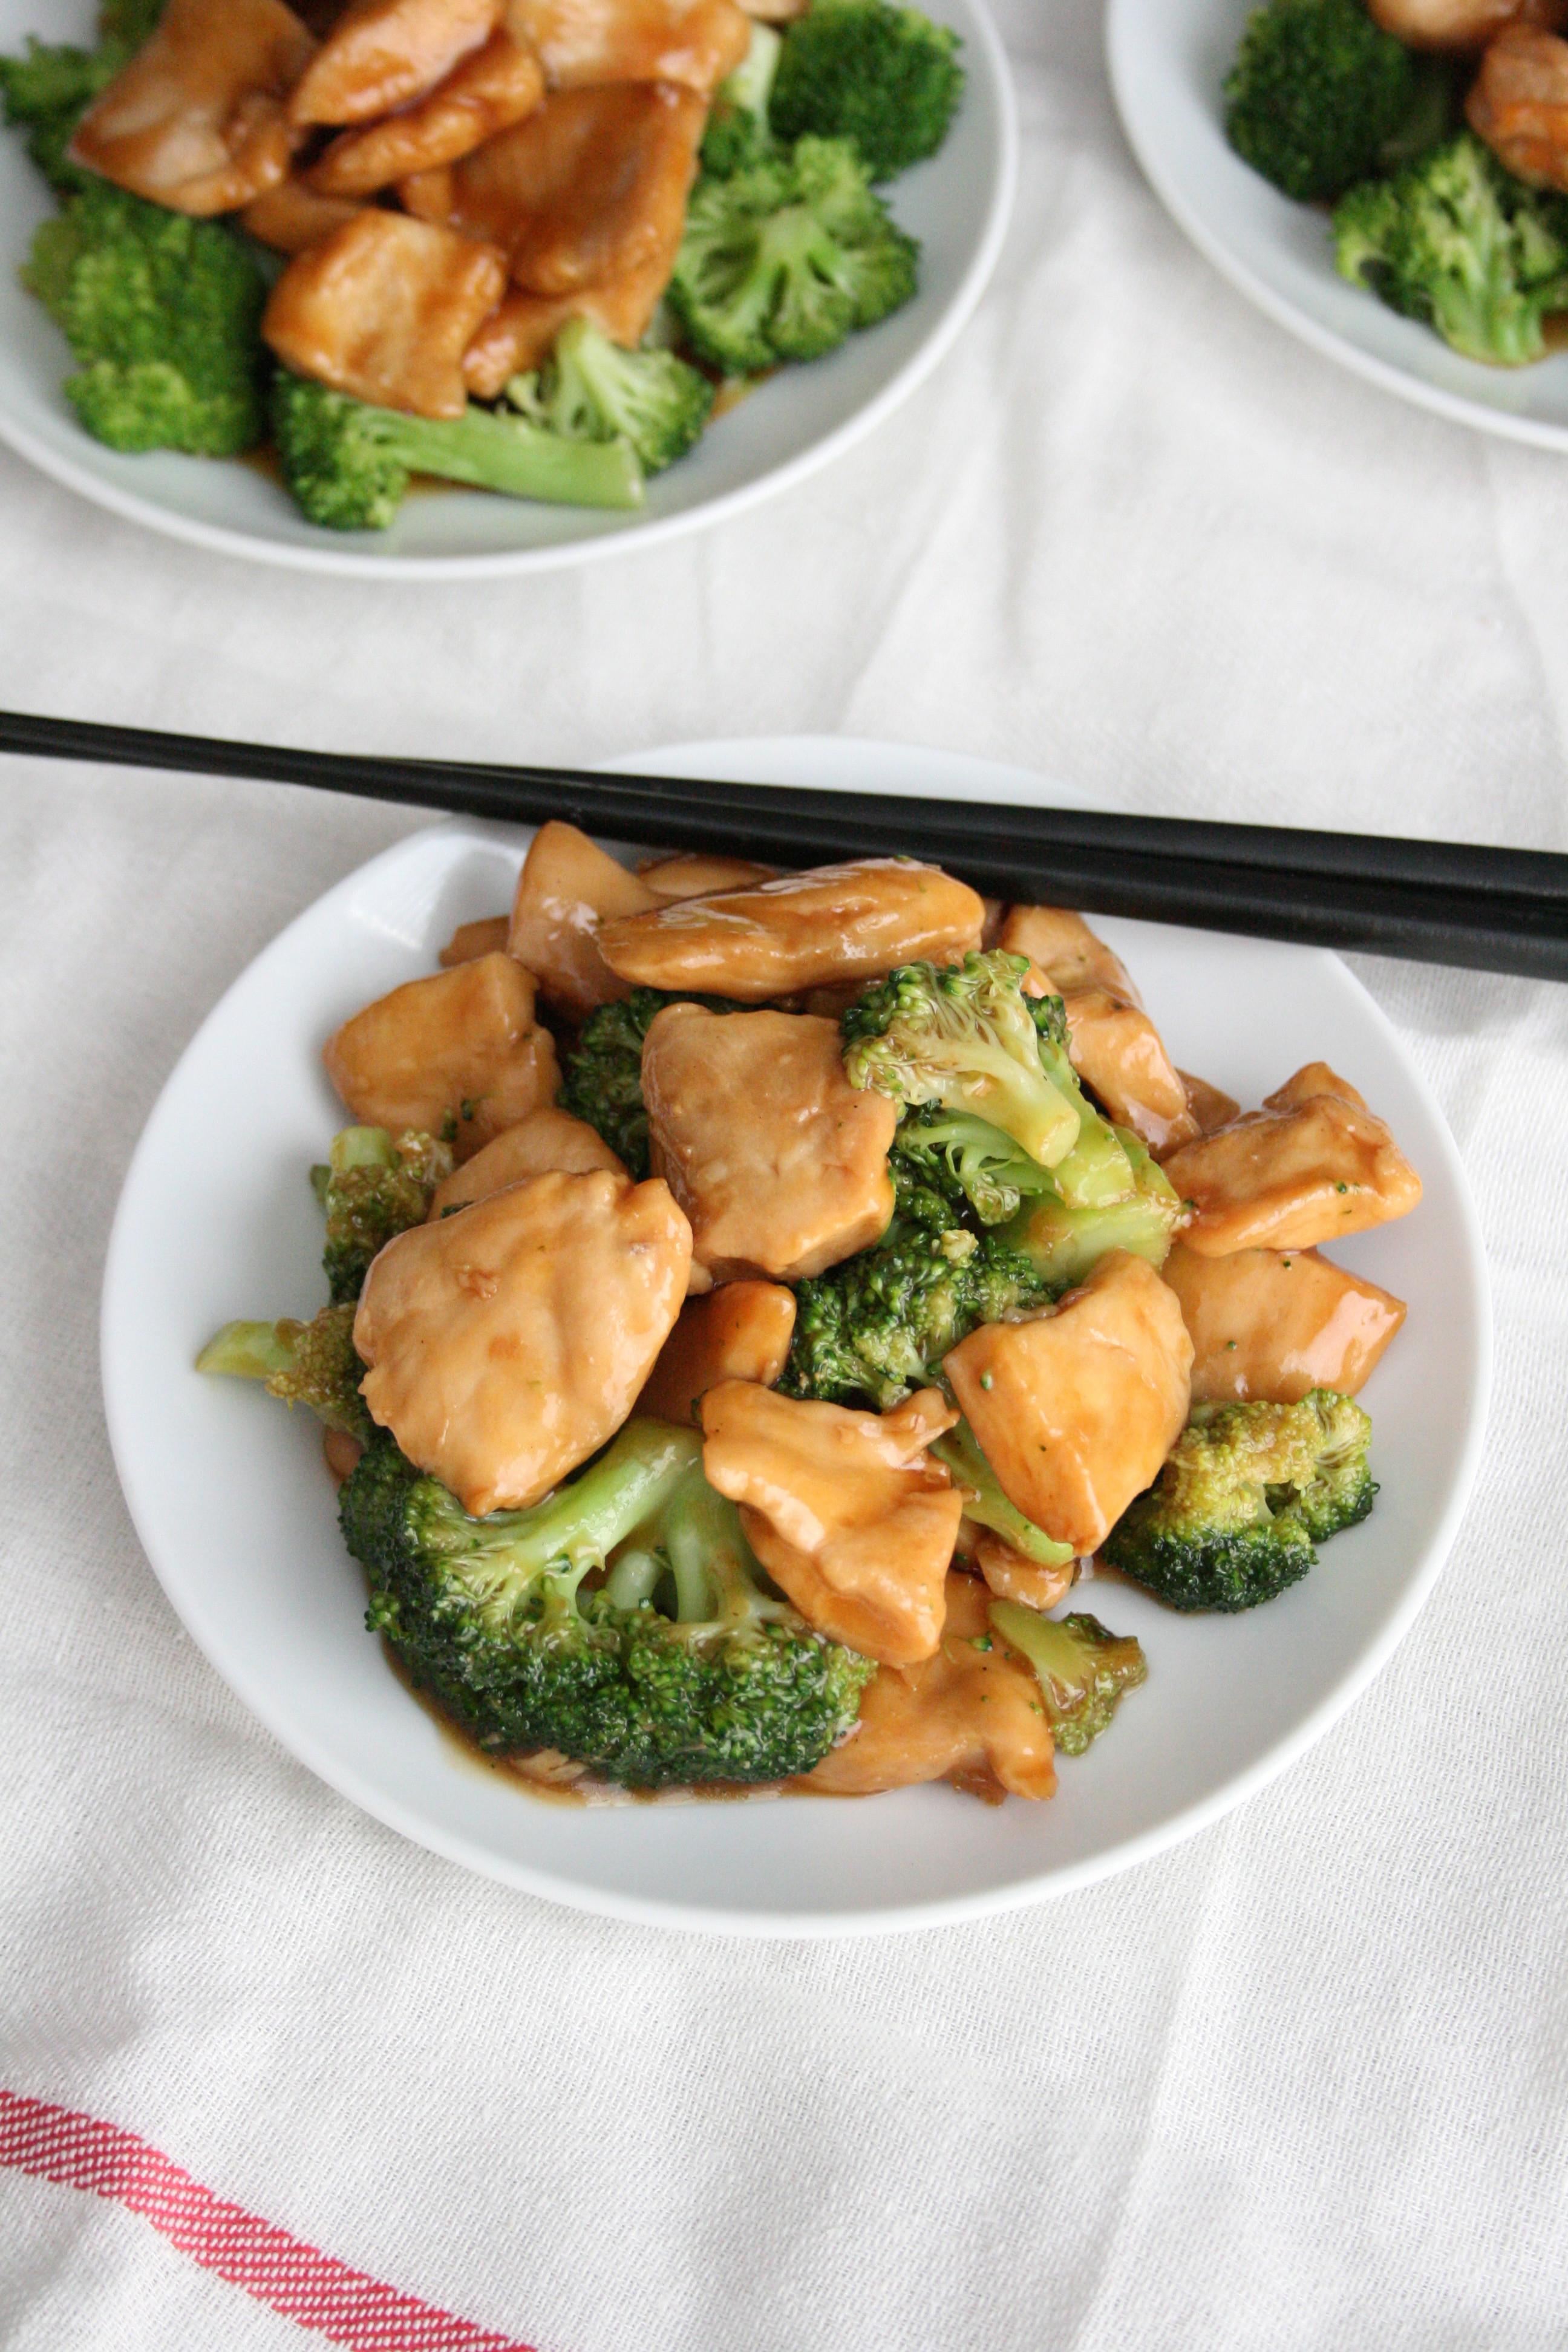 Chicken Broccoli Recipe  chicken broccoli soy sauce stir fry